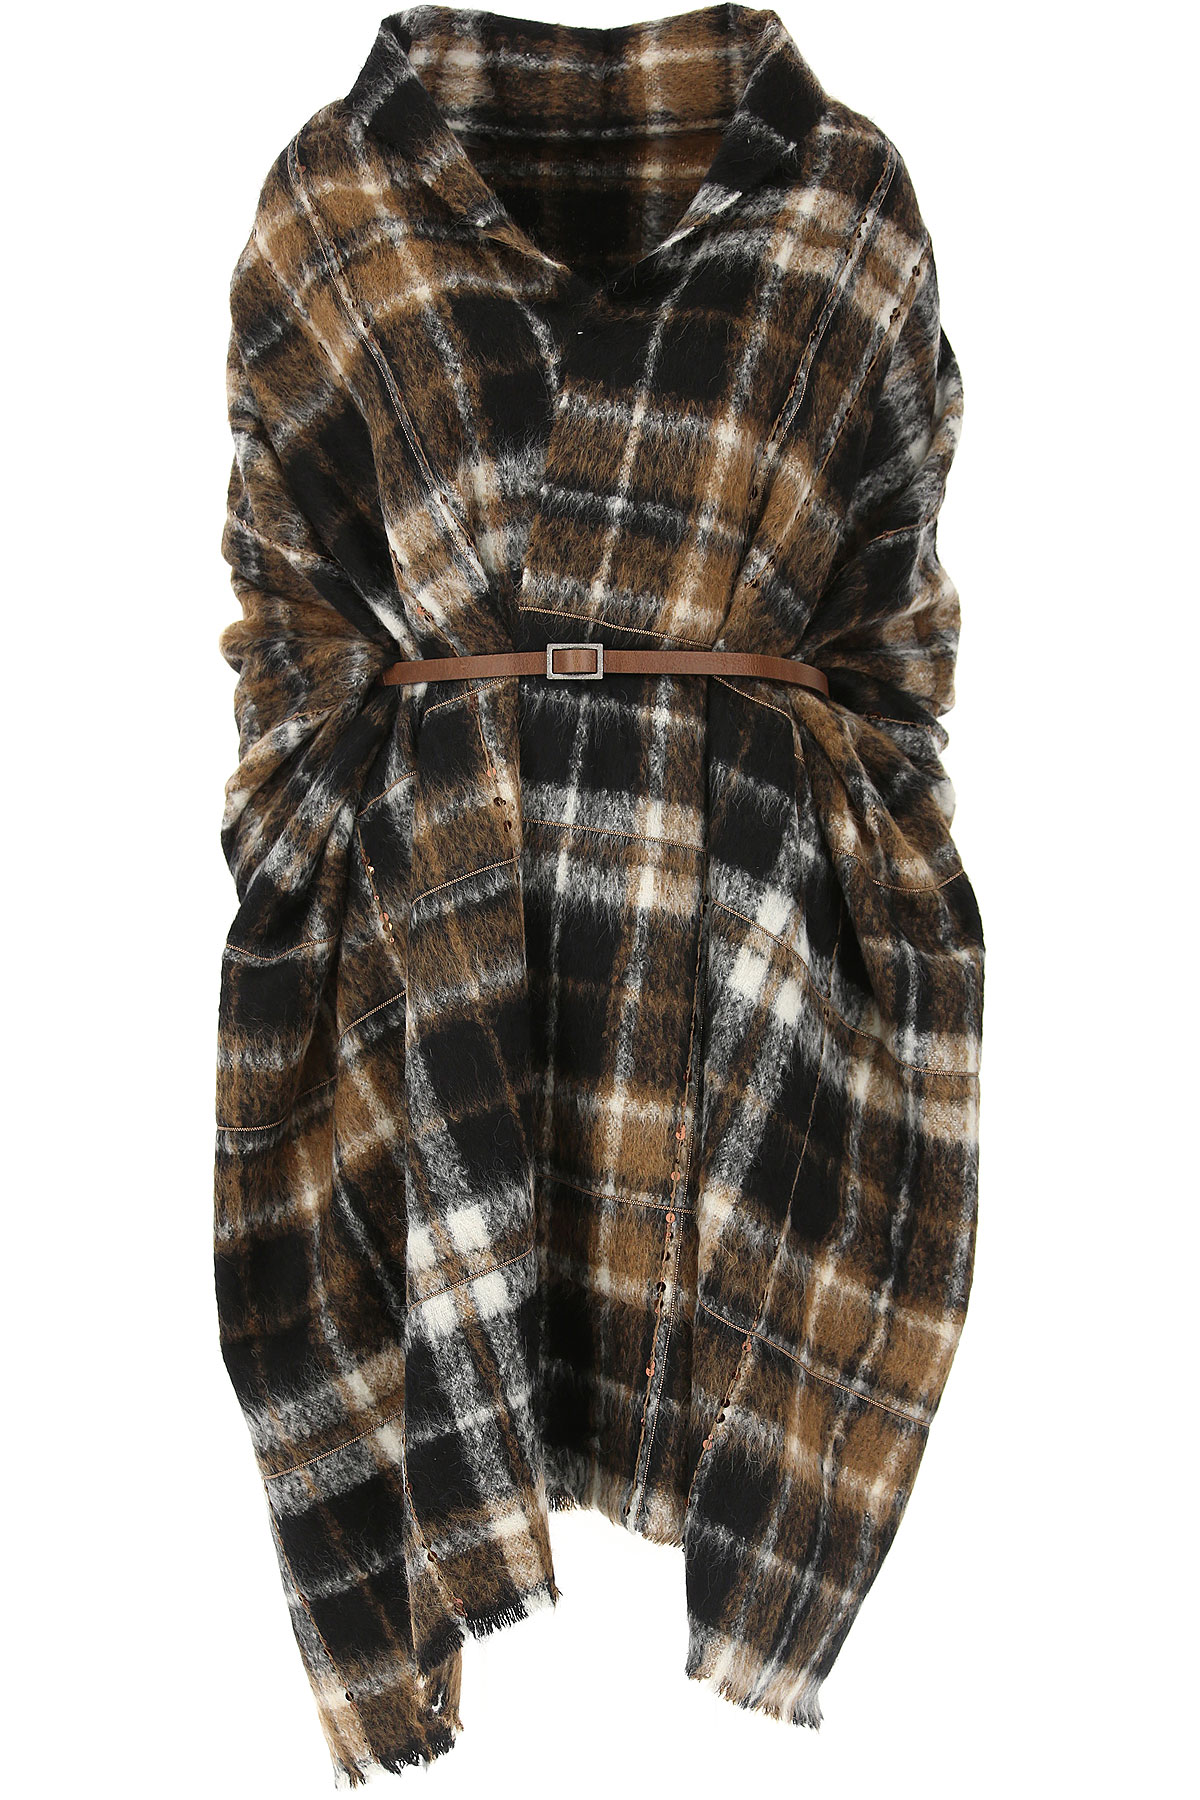 Image of Brunello Cucinelli Womens Clothing, Black, alpaca, 2017